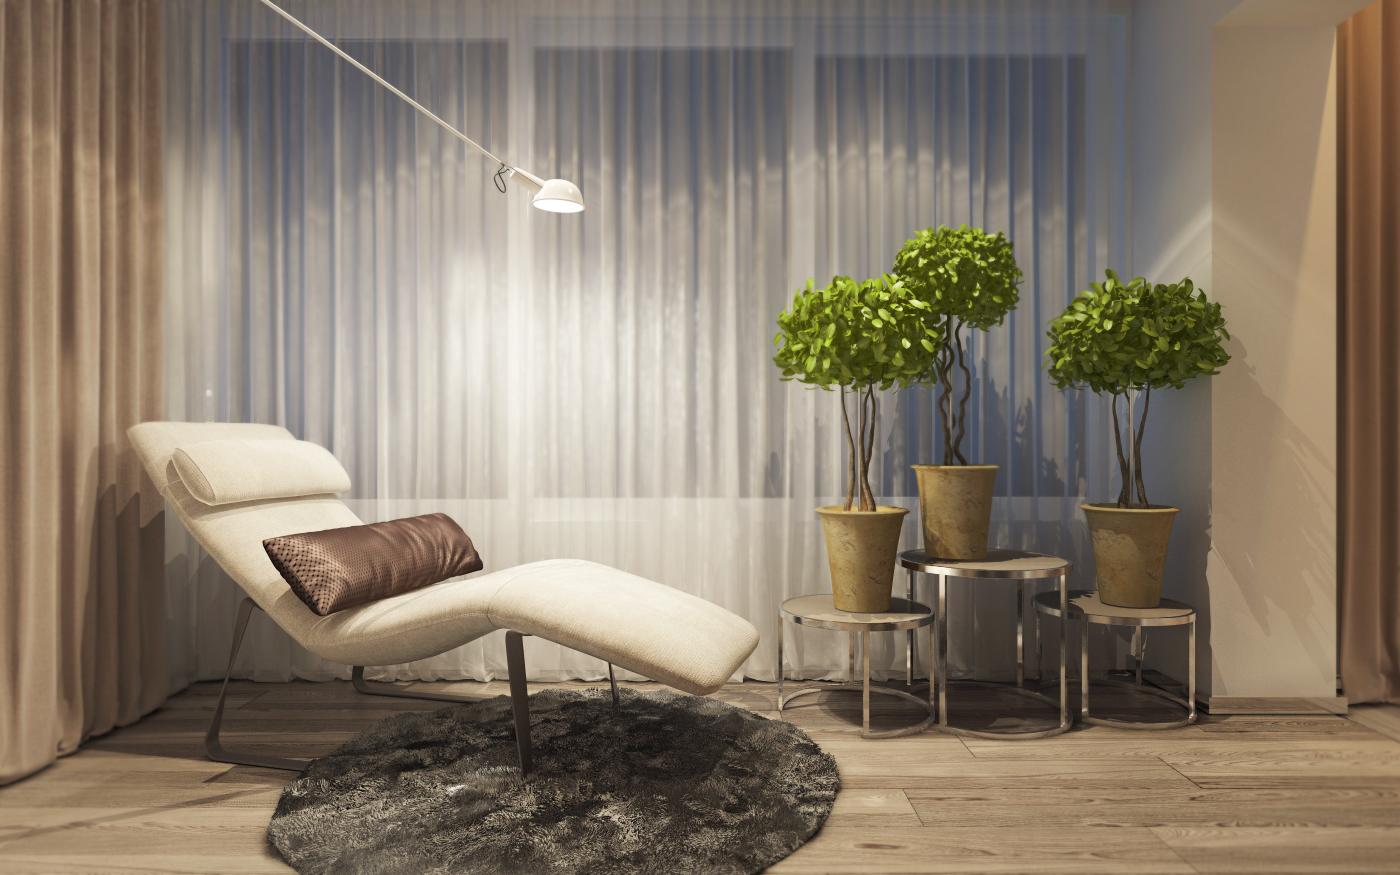 minimalist private room design